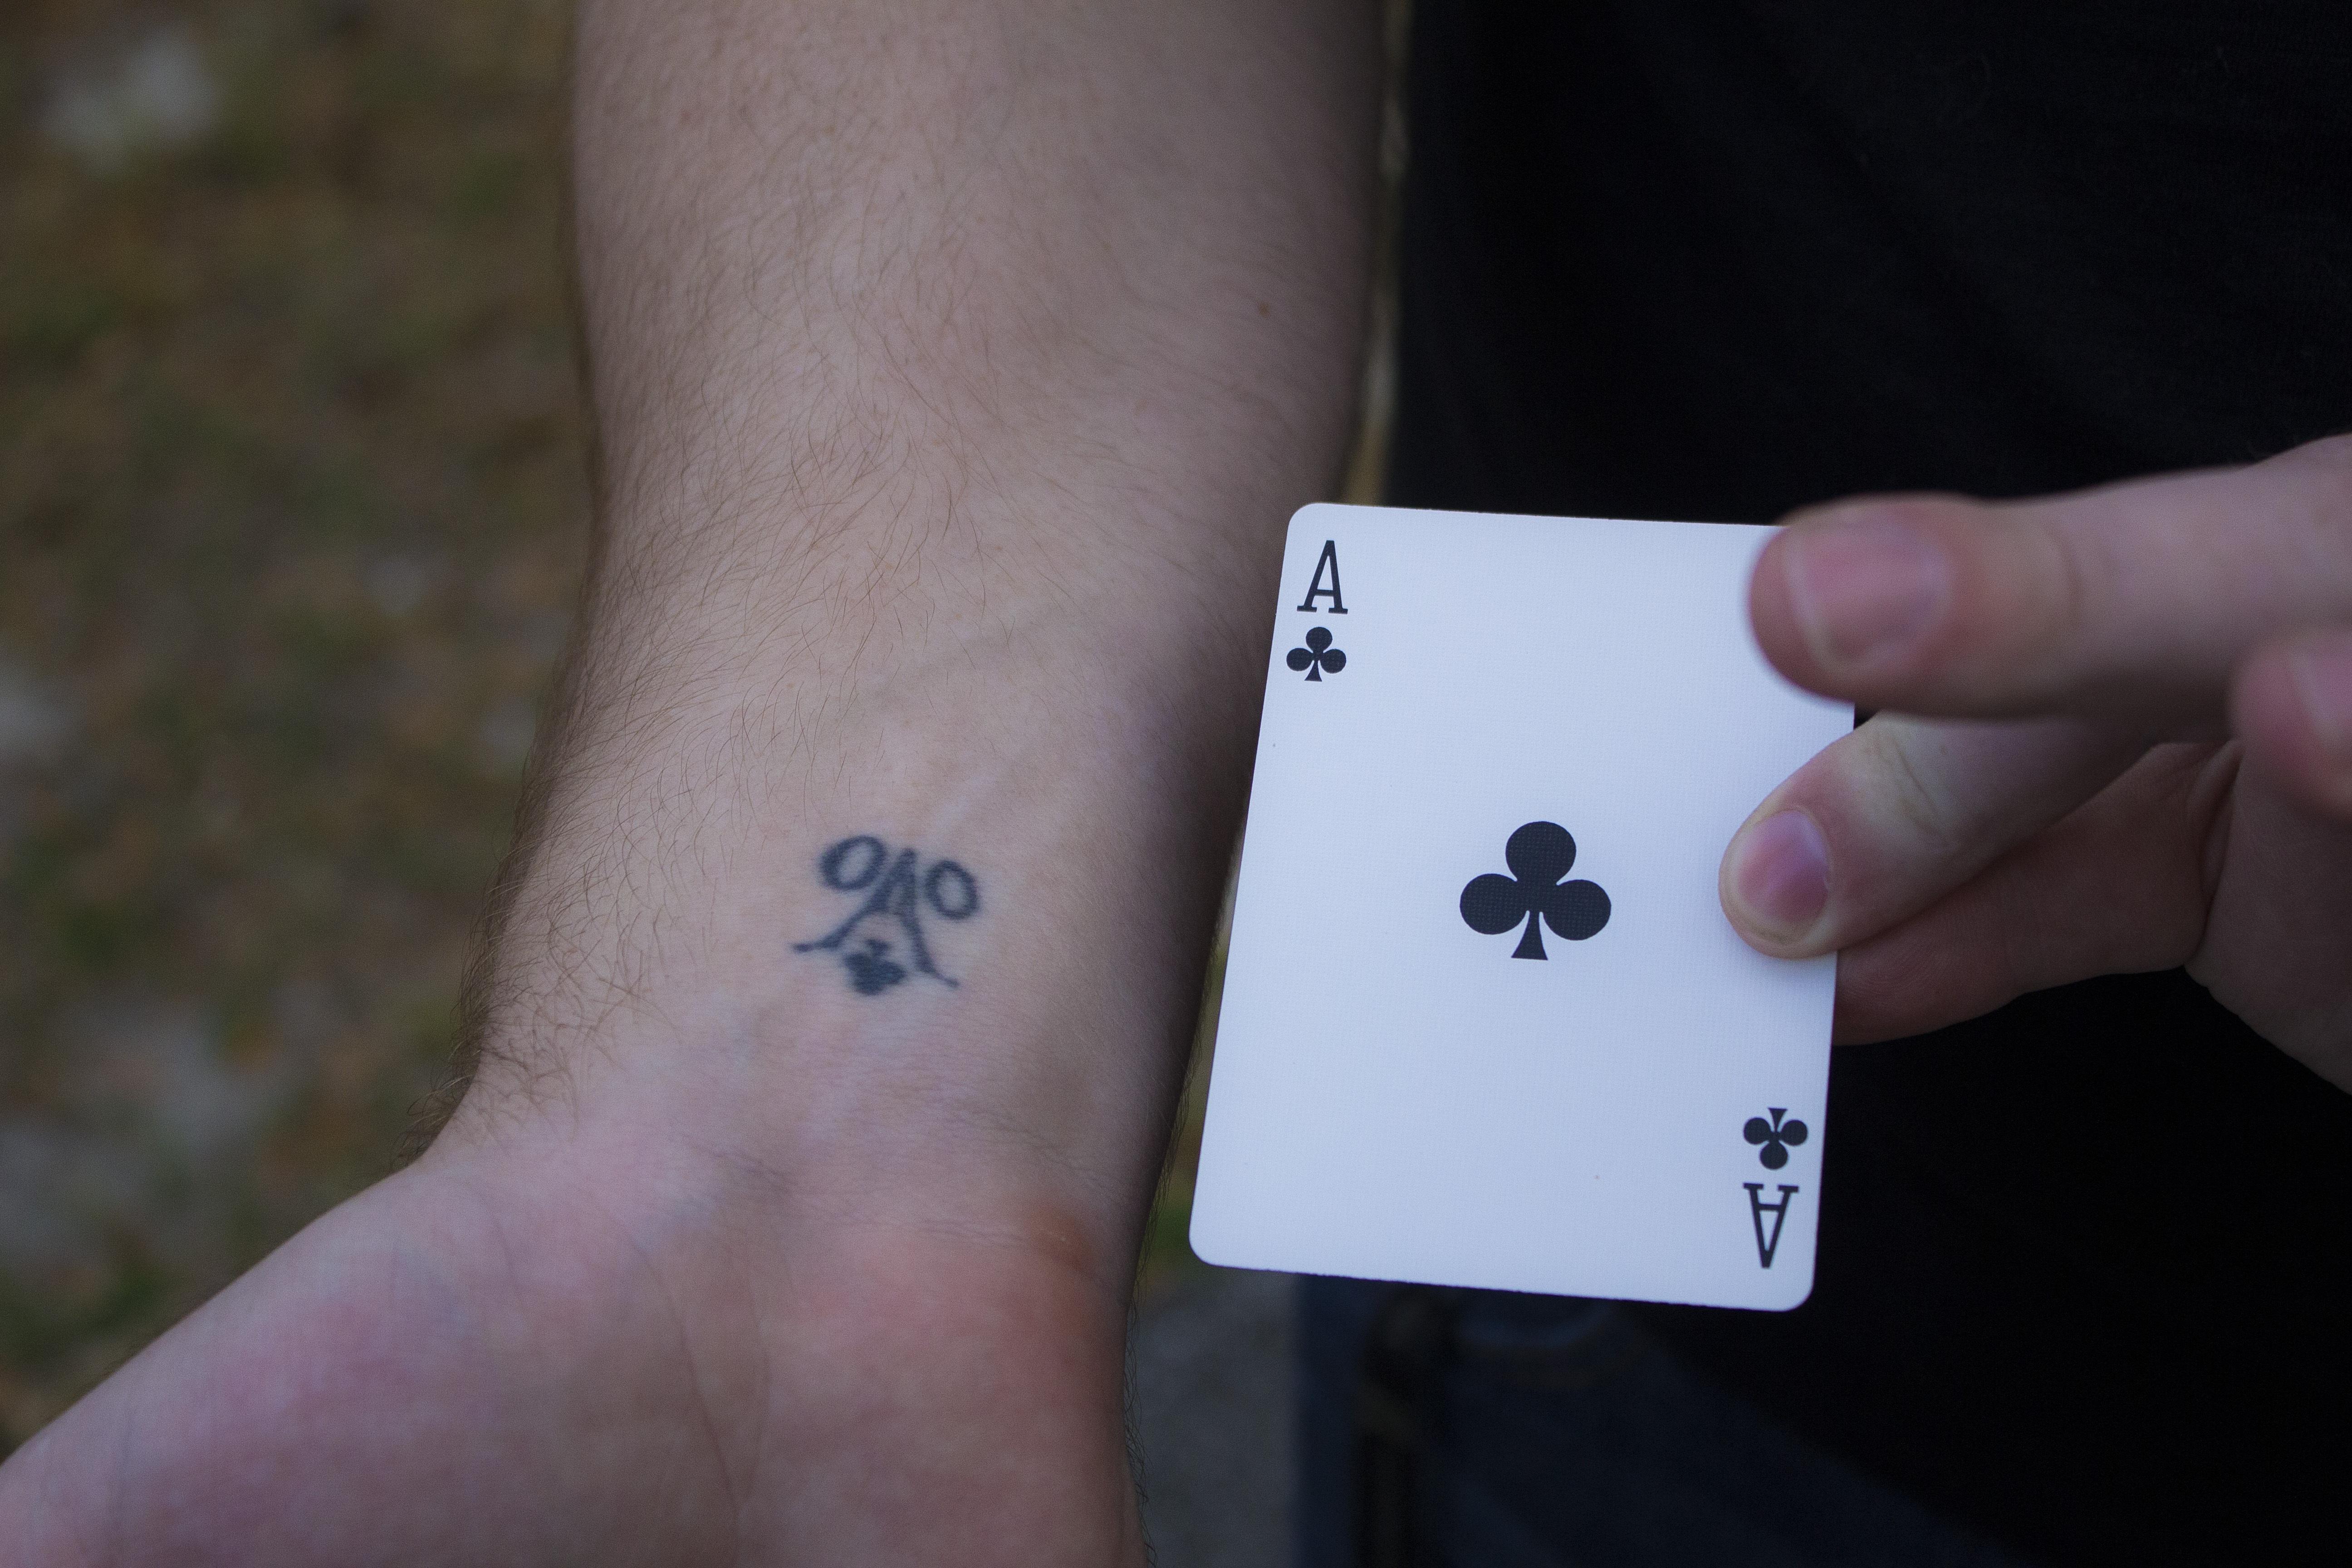 Fotos Gratis Mano Número Dedo Tatuaje Club Negro Brazo As